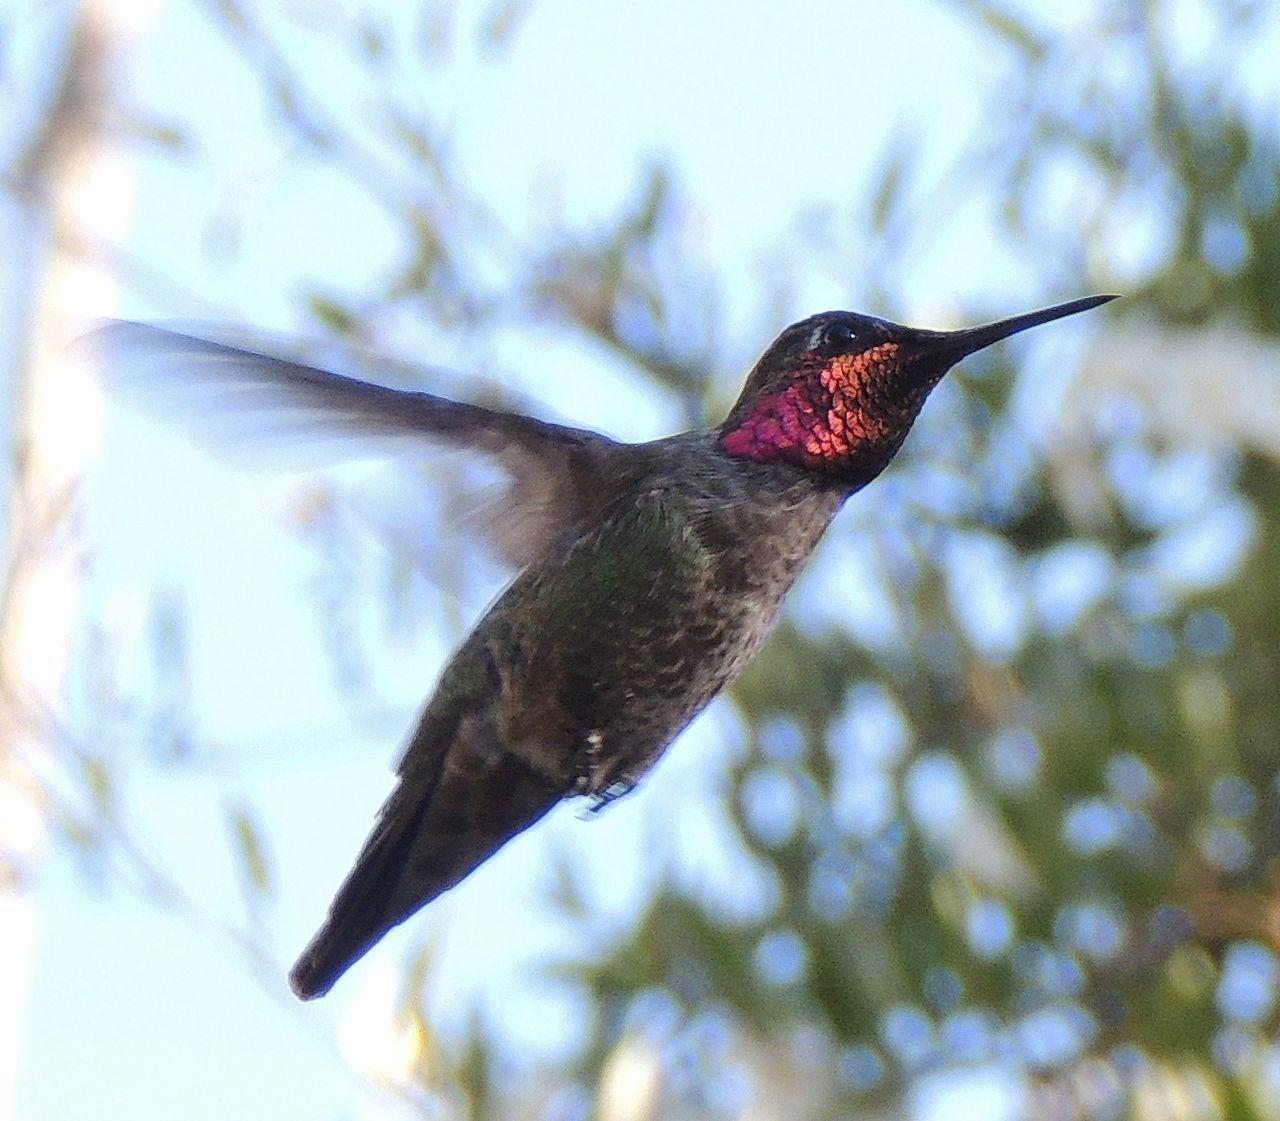 No time to stop and pose Hummingbird EyeEm Nature Lover Backyard Birder EyeEm Birds Bird Hummingbirds The Hummingbird Series